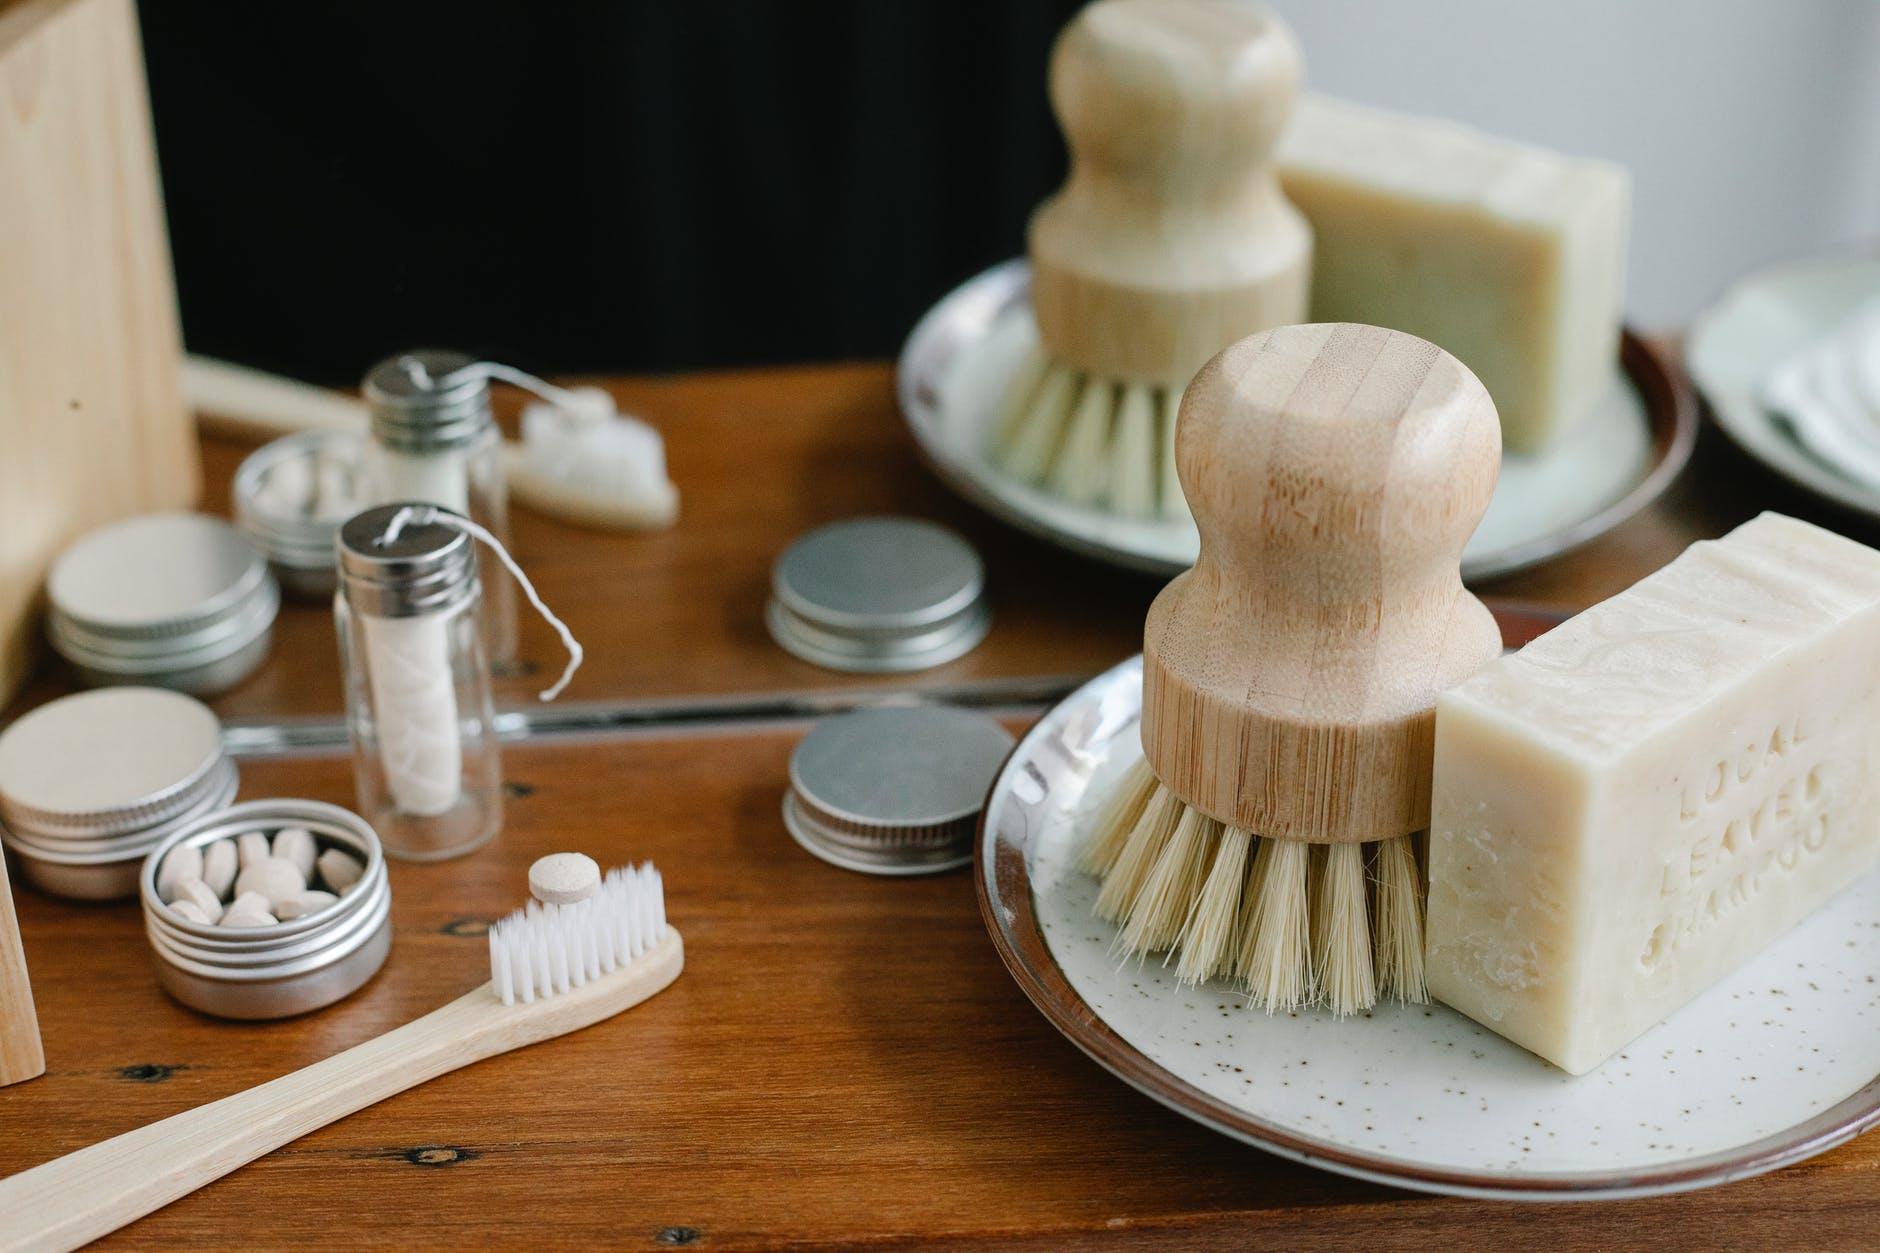 toothbrush neat body shrub and soap